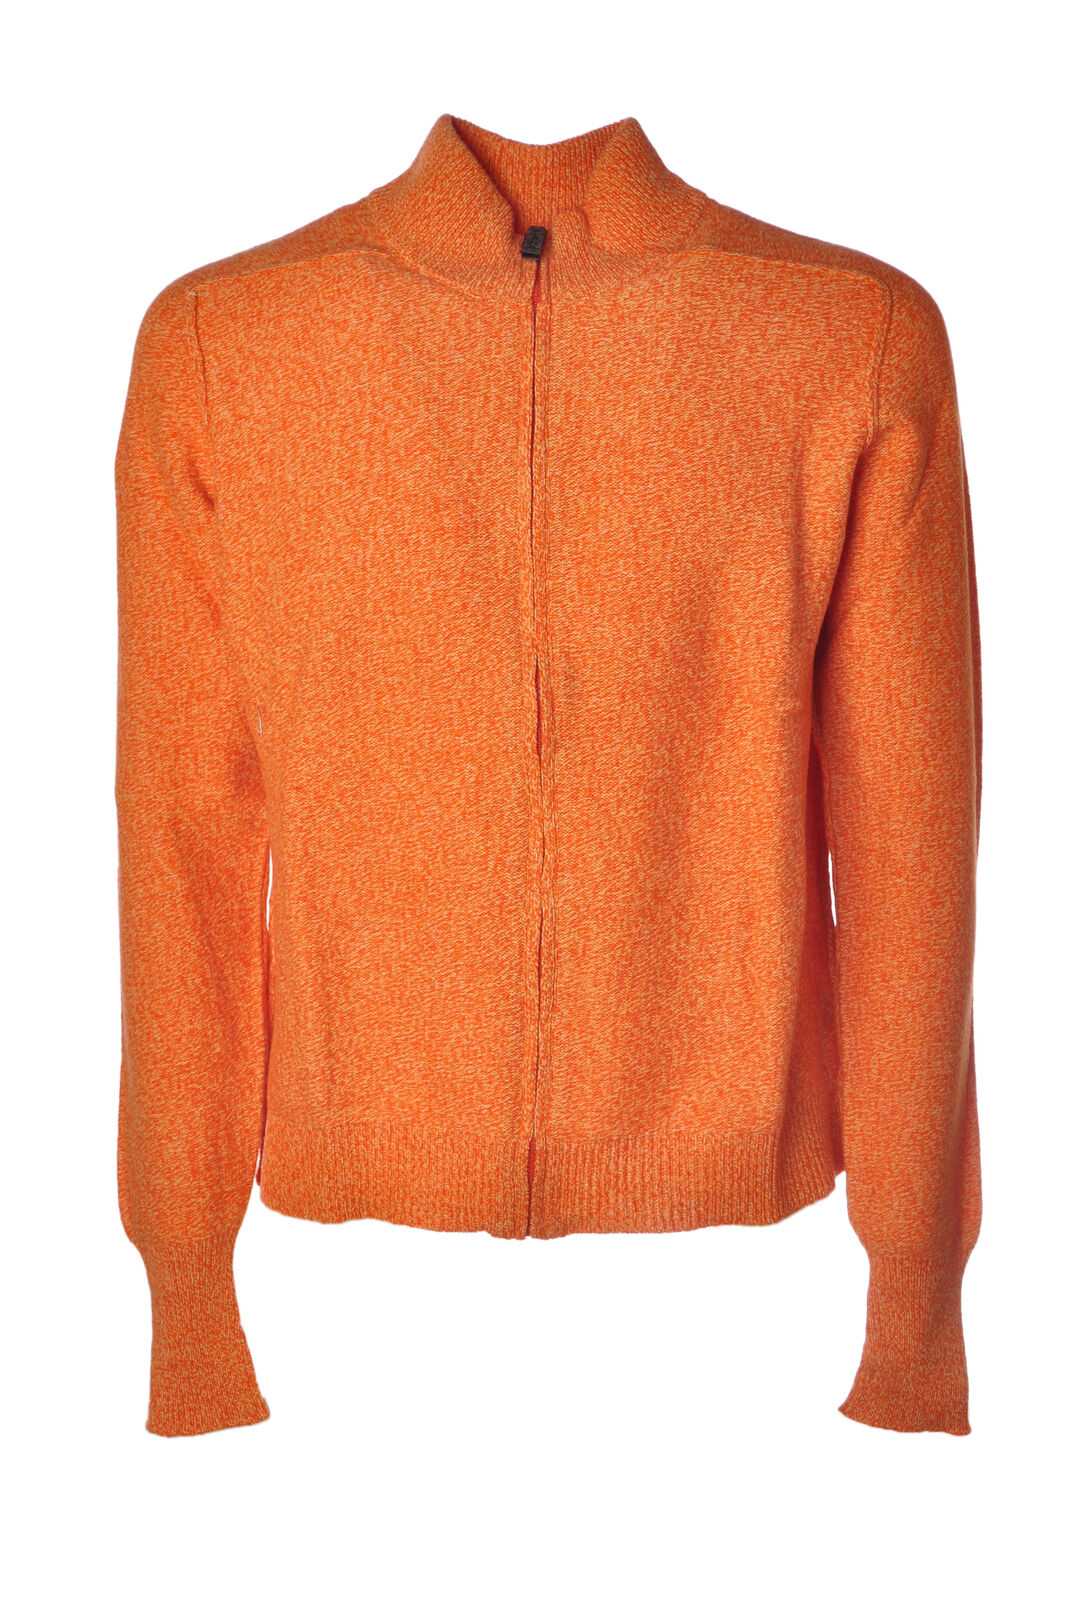 cde0e09f Alpha - Sweaters Male - - 4560923A184021 - orange noyzlr10691-T ...